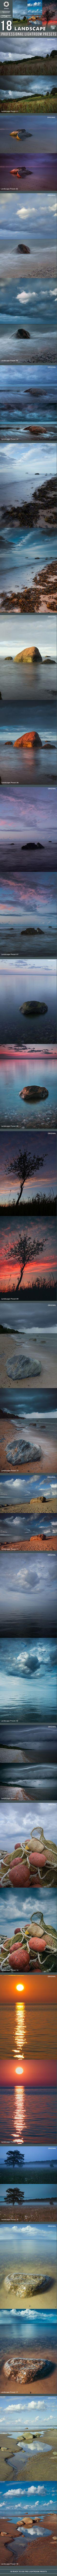 18 Professional Landscape Lightroom Presets #photography Download: http://graphicriver.net/item/18-professional-landscape-lightroom-presets/13238163?ref=ksioks